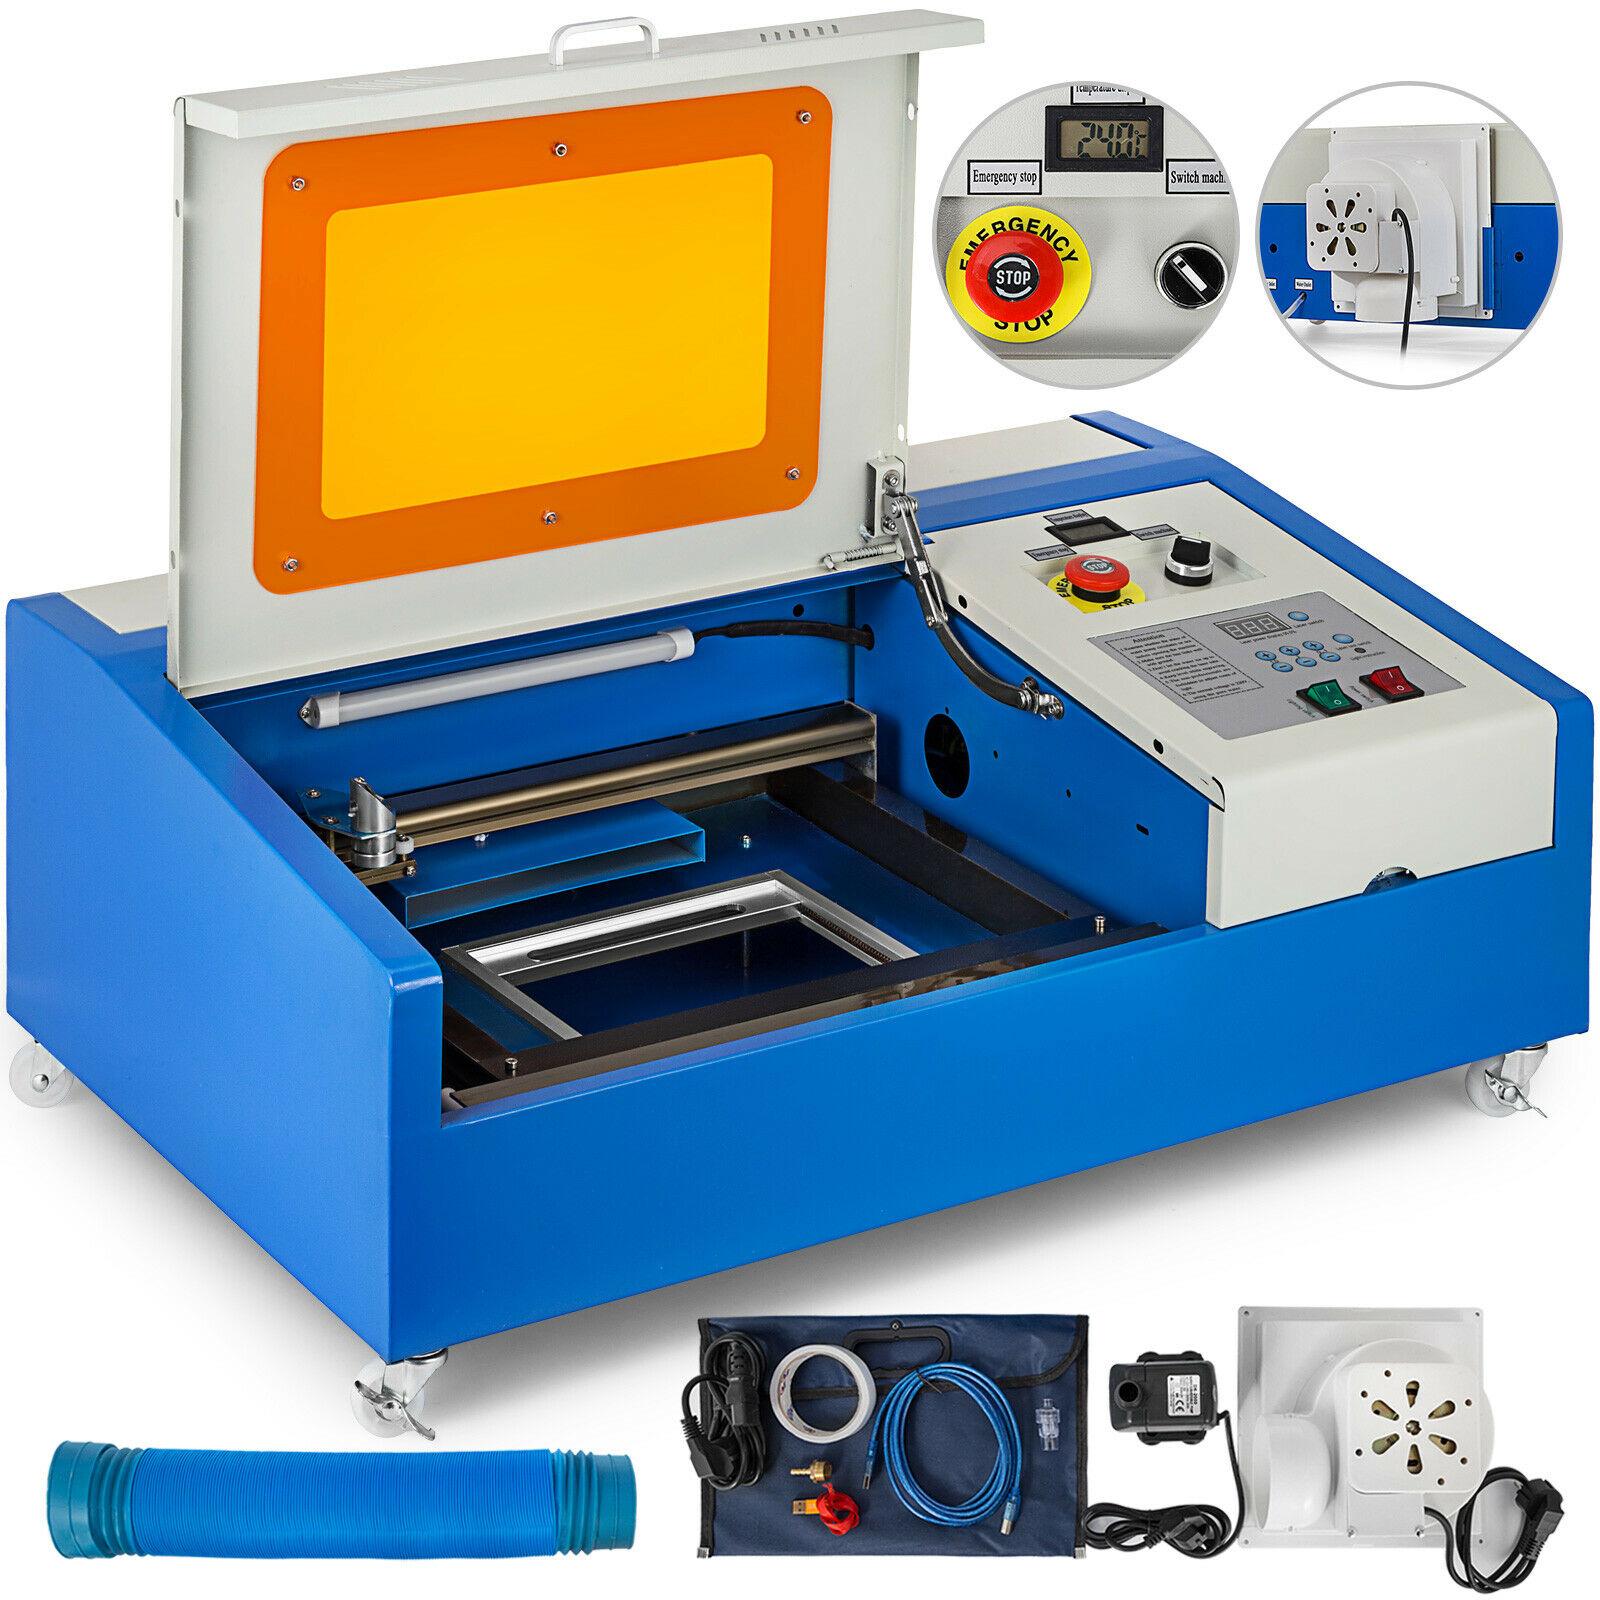 New USB CO2 CO2 Laser Engraving Cutting Machine Laser Engraver 220V/110V 40W